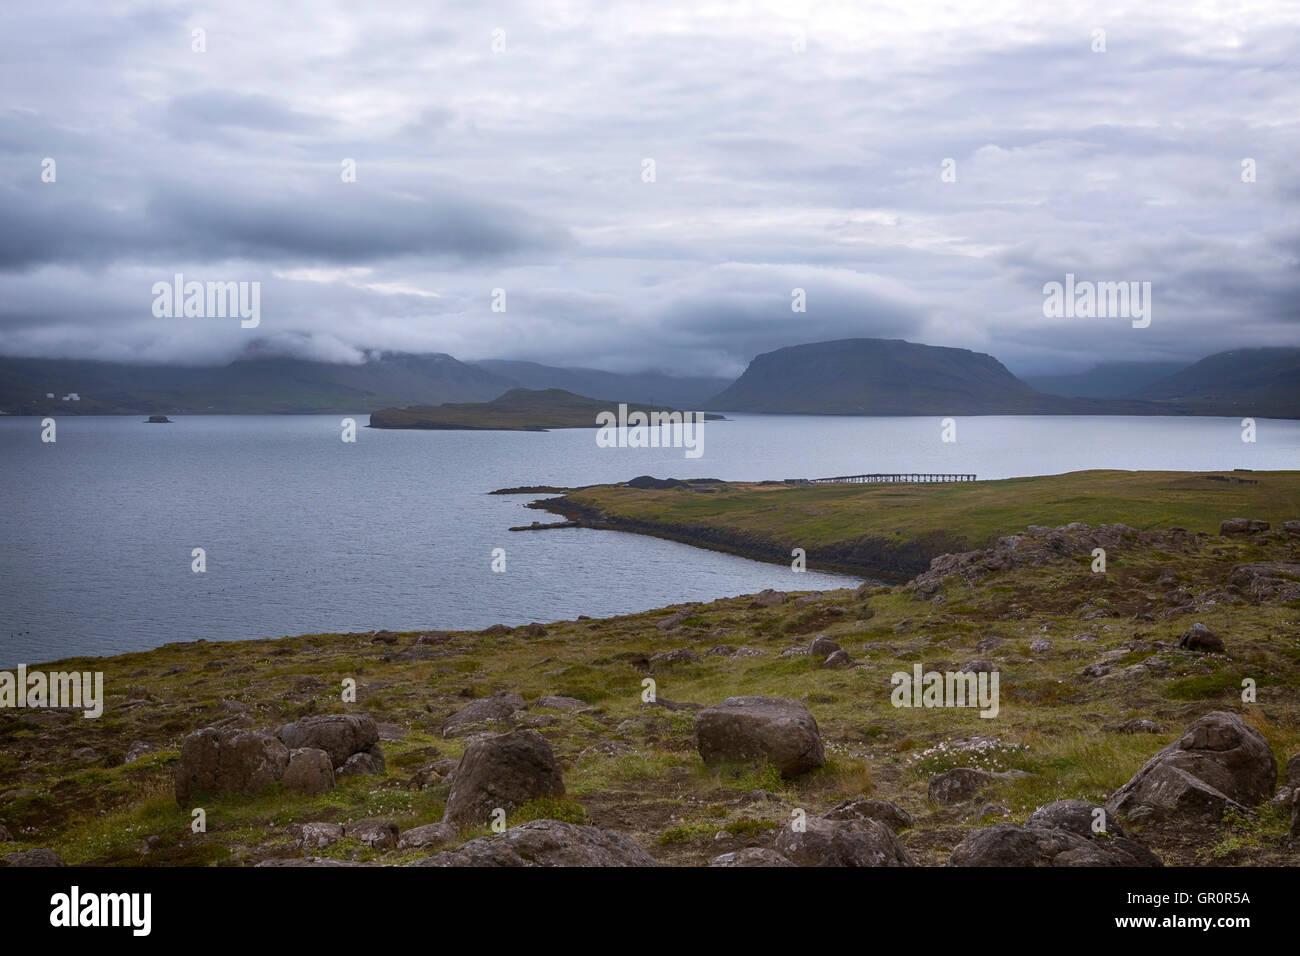 Hvalfjordur, Fjord, Islande Photo Stock